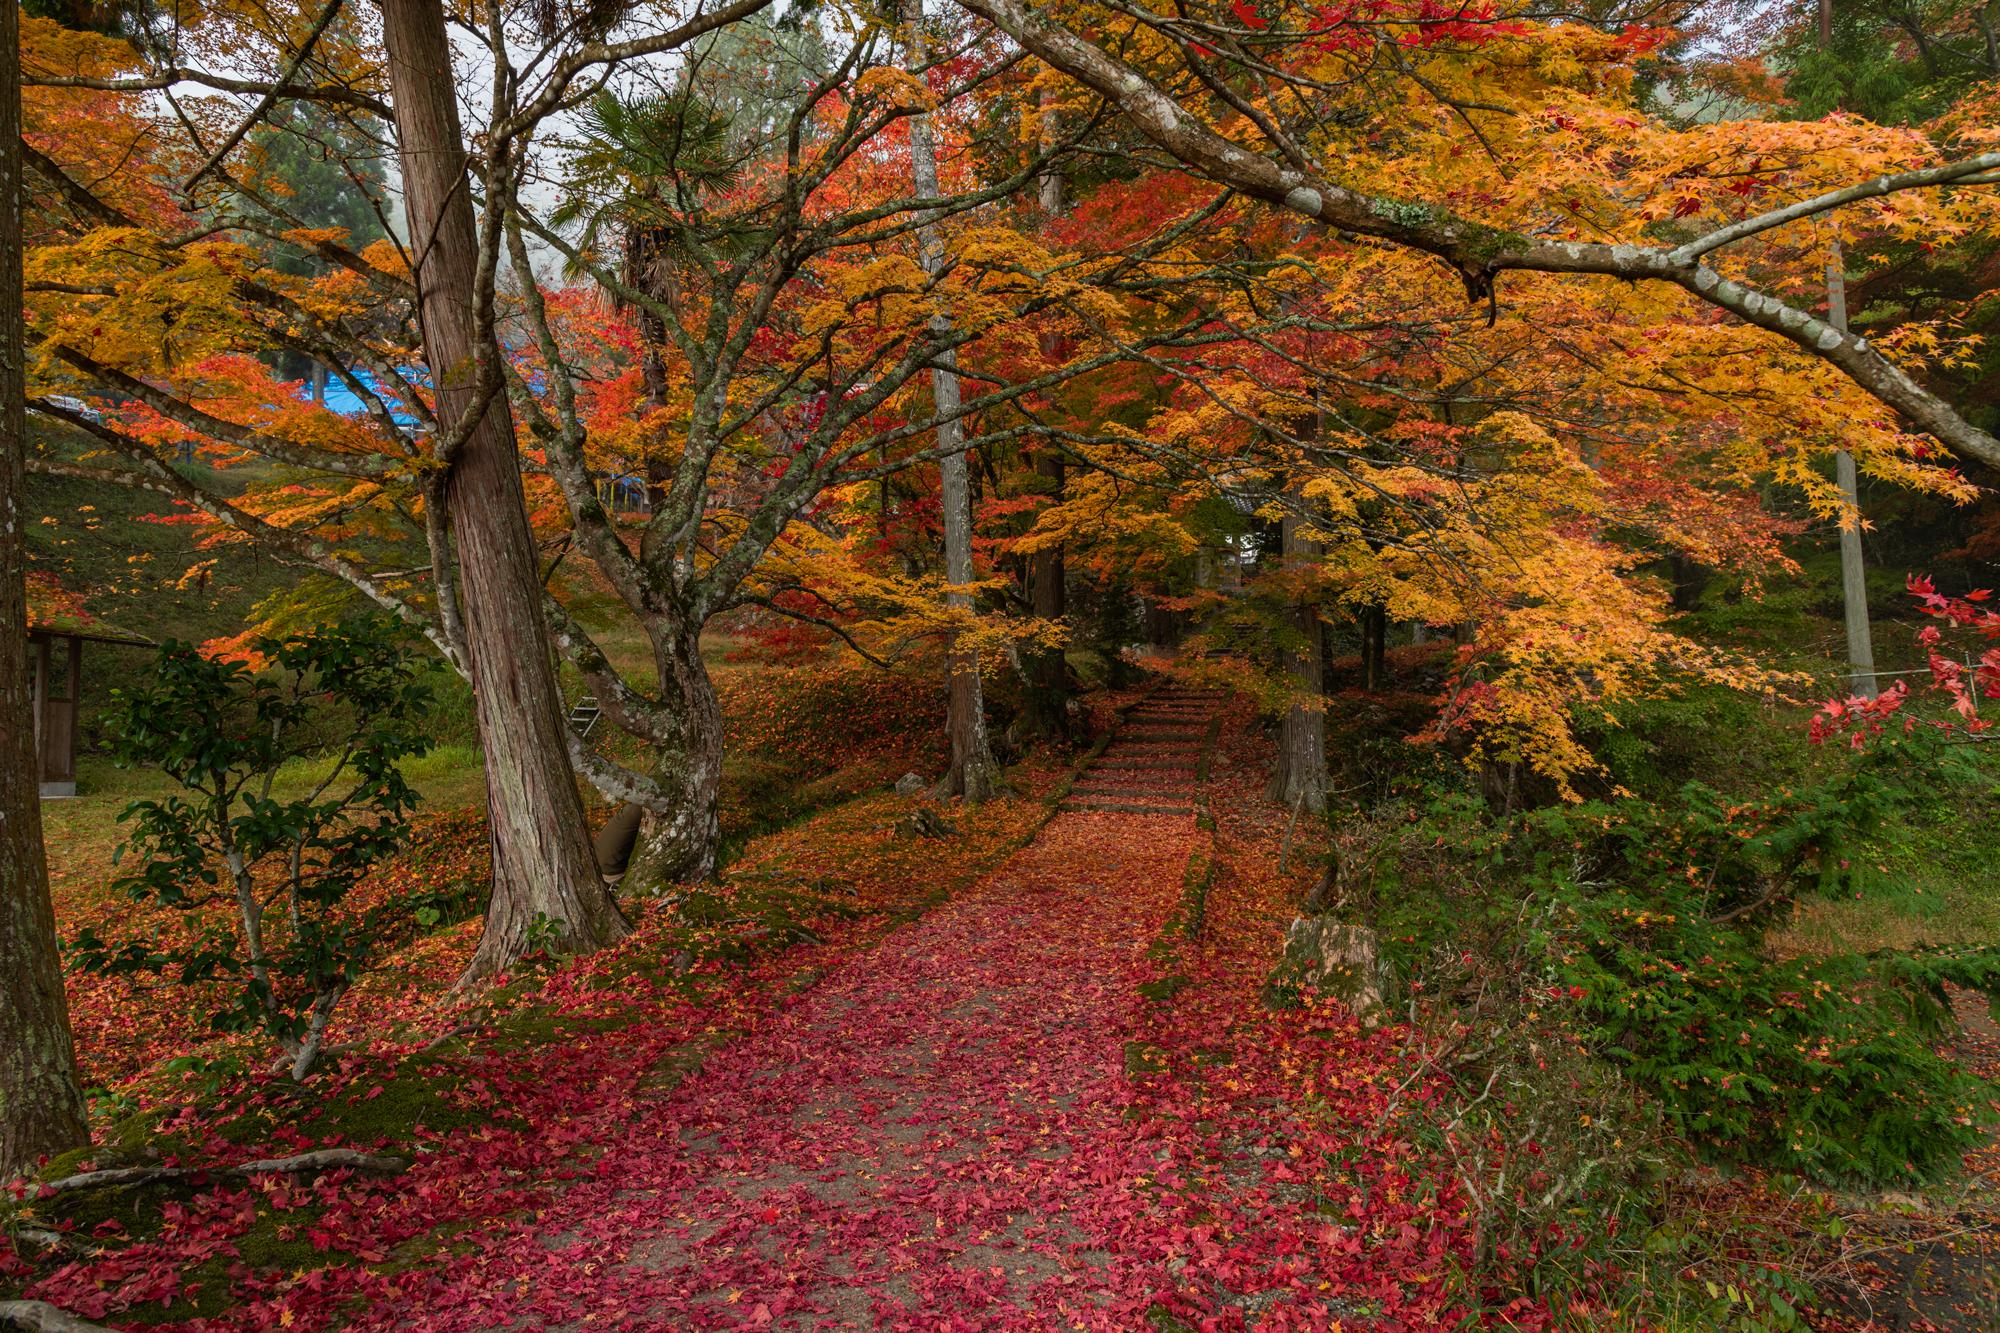 NIKON-CORPORATION_NIKON-D850_2785361074-2785469014_20909 京都  龍穏寺 Kyoto Ryoonji temple( 南丹市にある境内へ続く紅葉のトンネルが美しいおすすめの写真スポット!撮影した写真の紹介、アクセス情報・駐車場・交通手段など!)